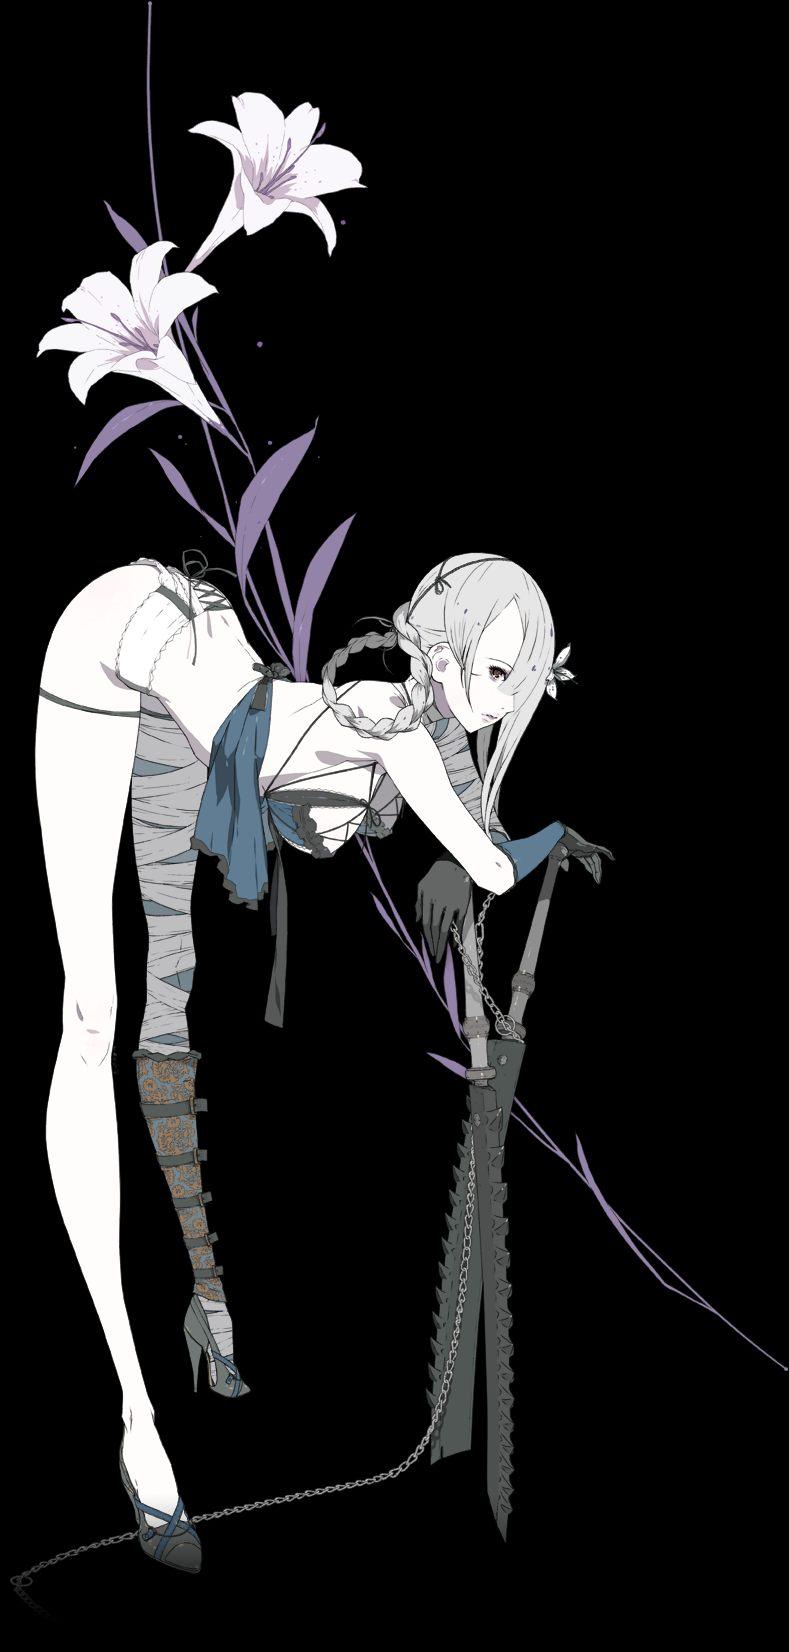 Boku no sexual harassment wiki